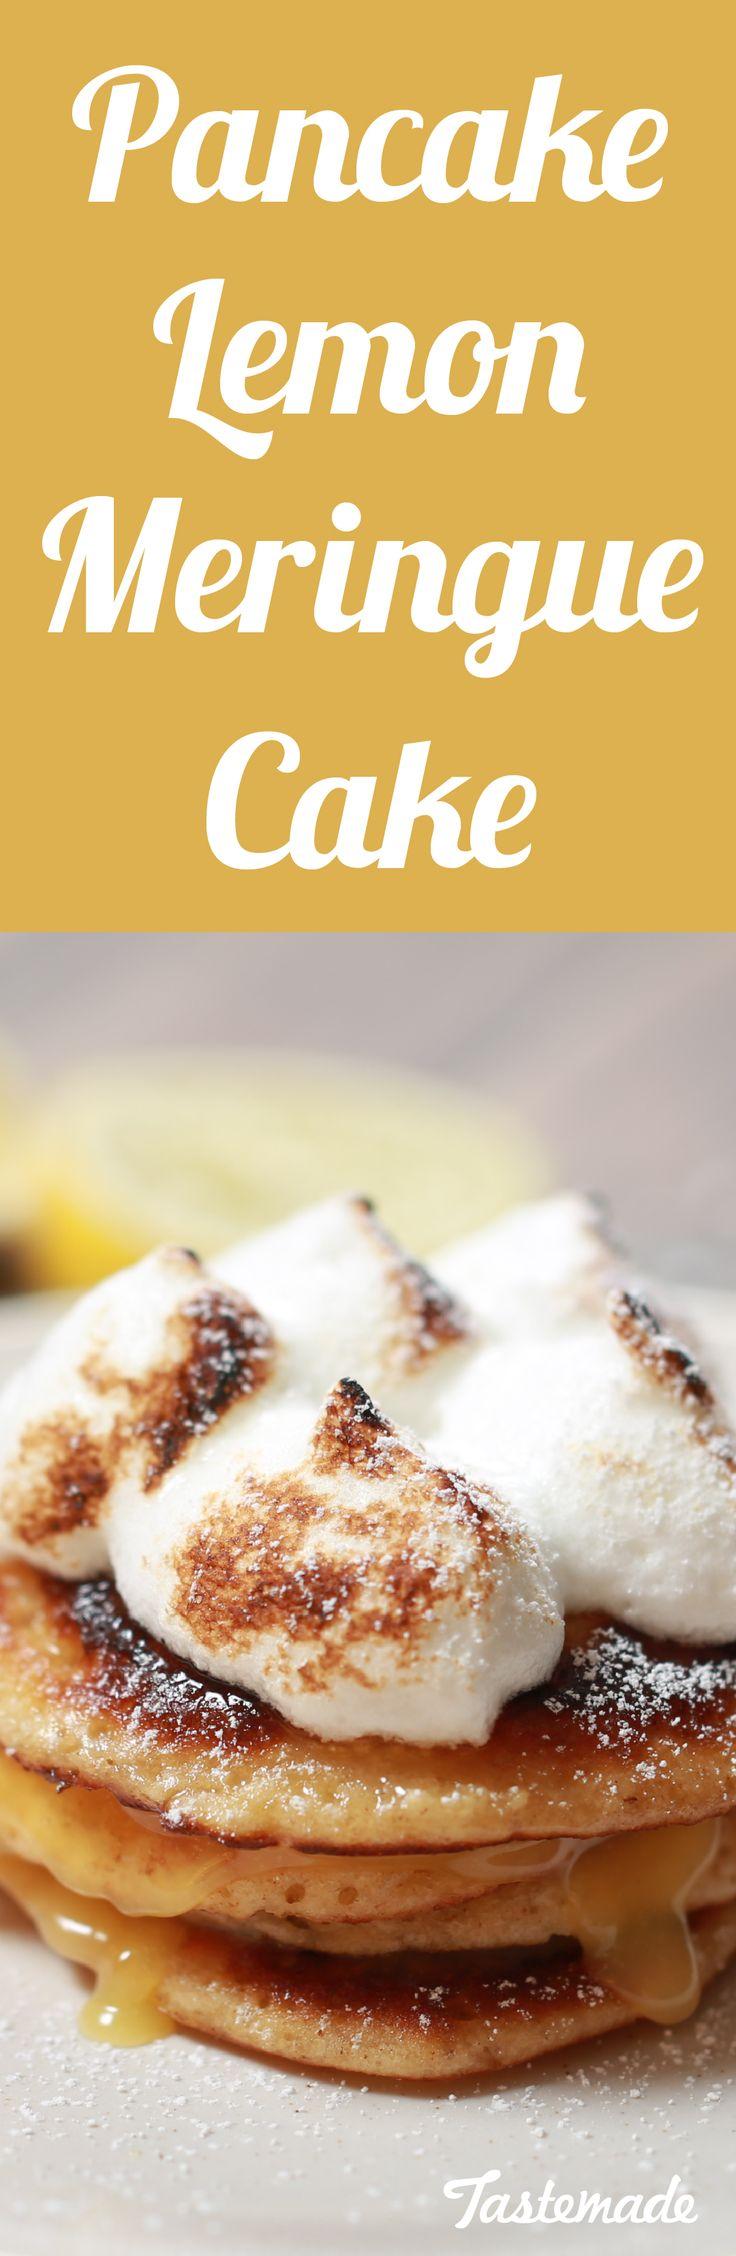 Best 25 Pancake Toppings Ideas On Pinterest Lemon Syrup Recipe For Pancakes Strawberry